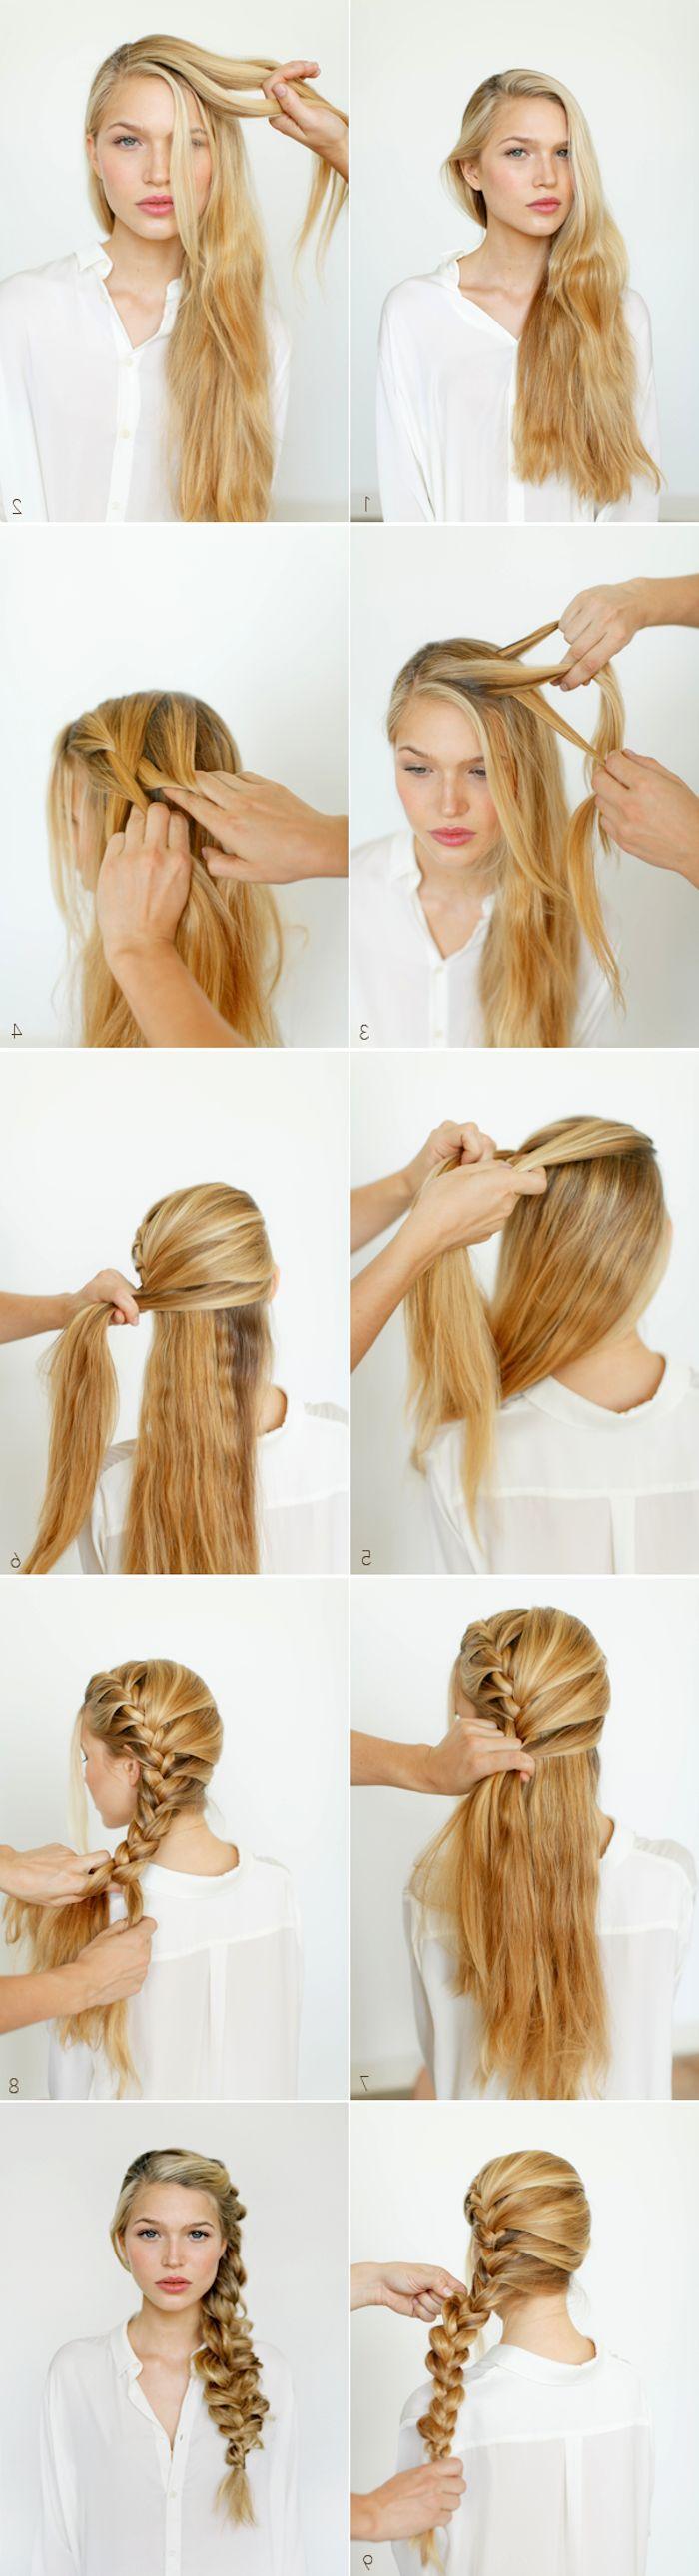 1001 inspiring ideas for simple self-made braids